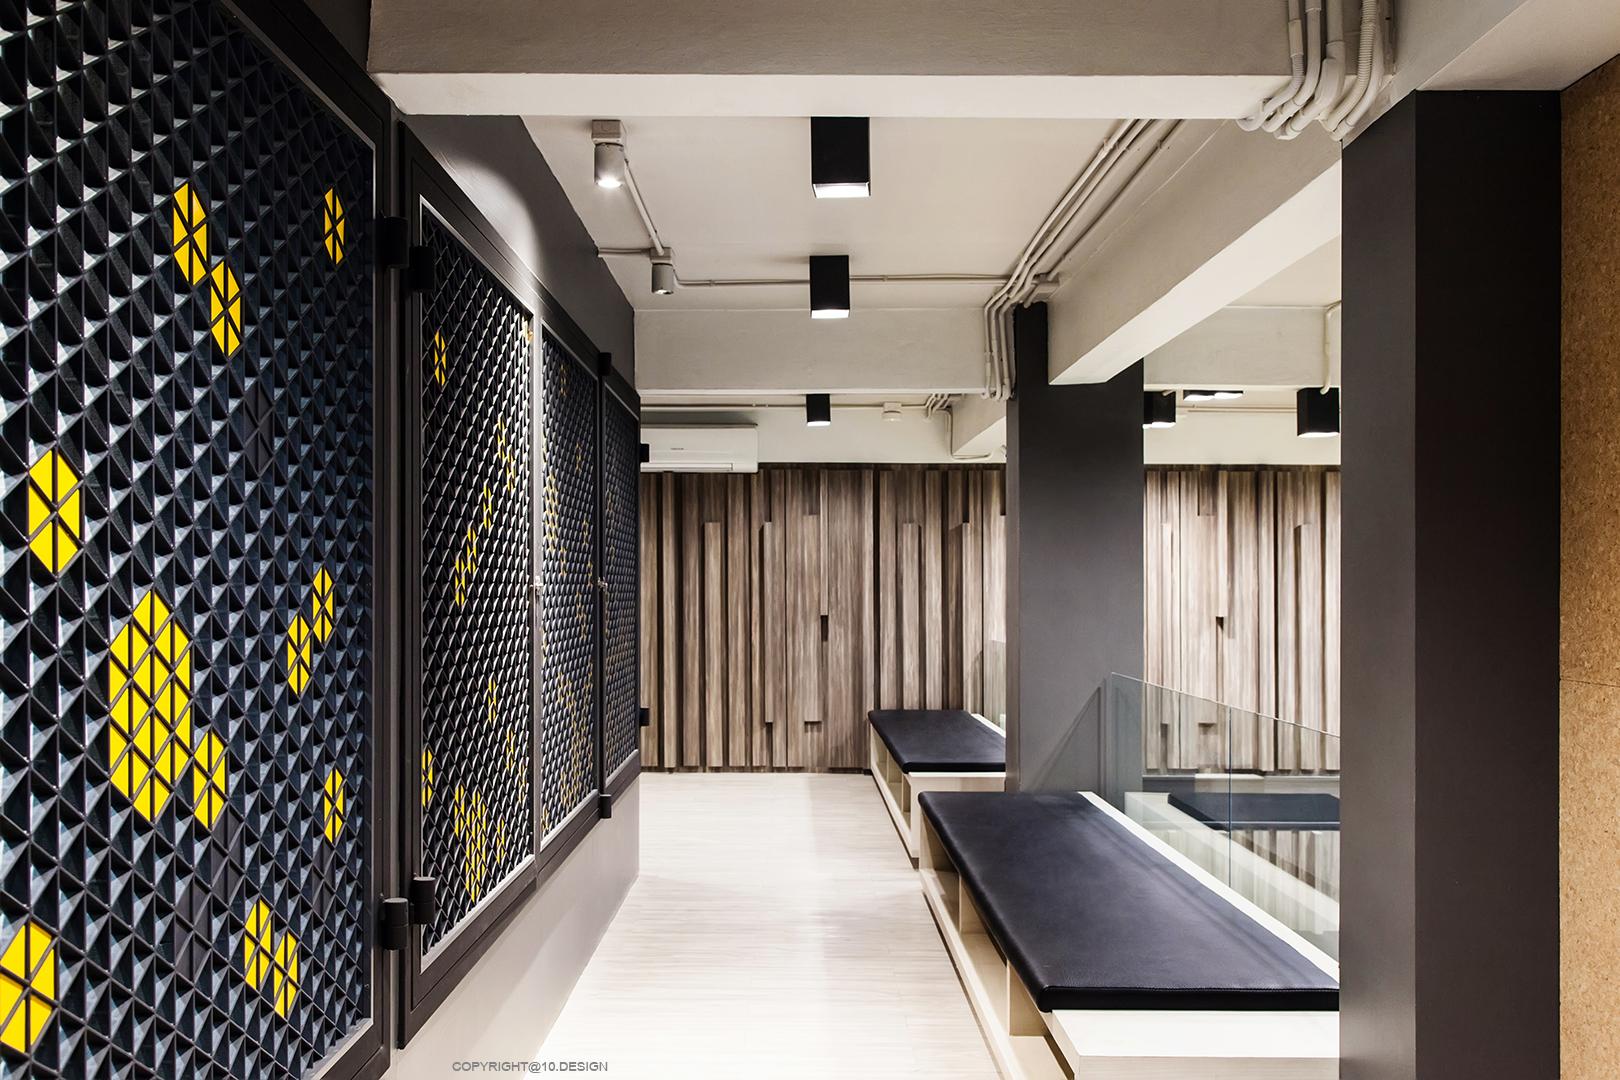 10DESIGN ookbee head office interior design start up 02